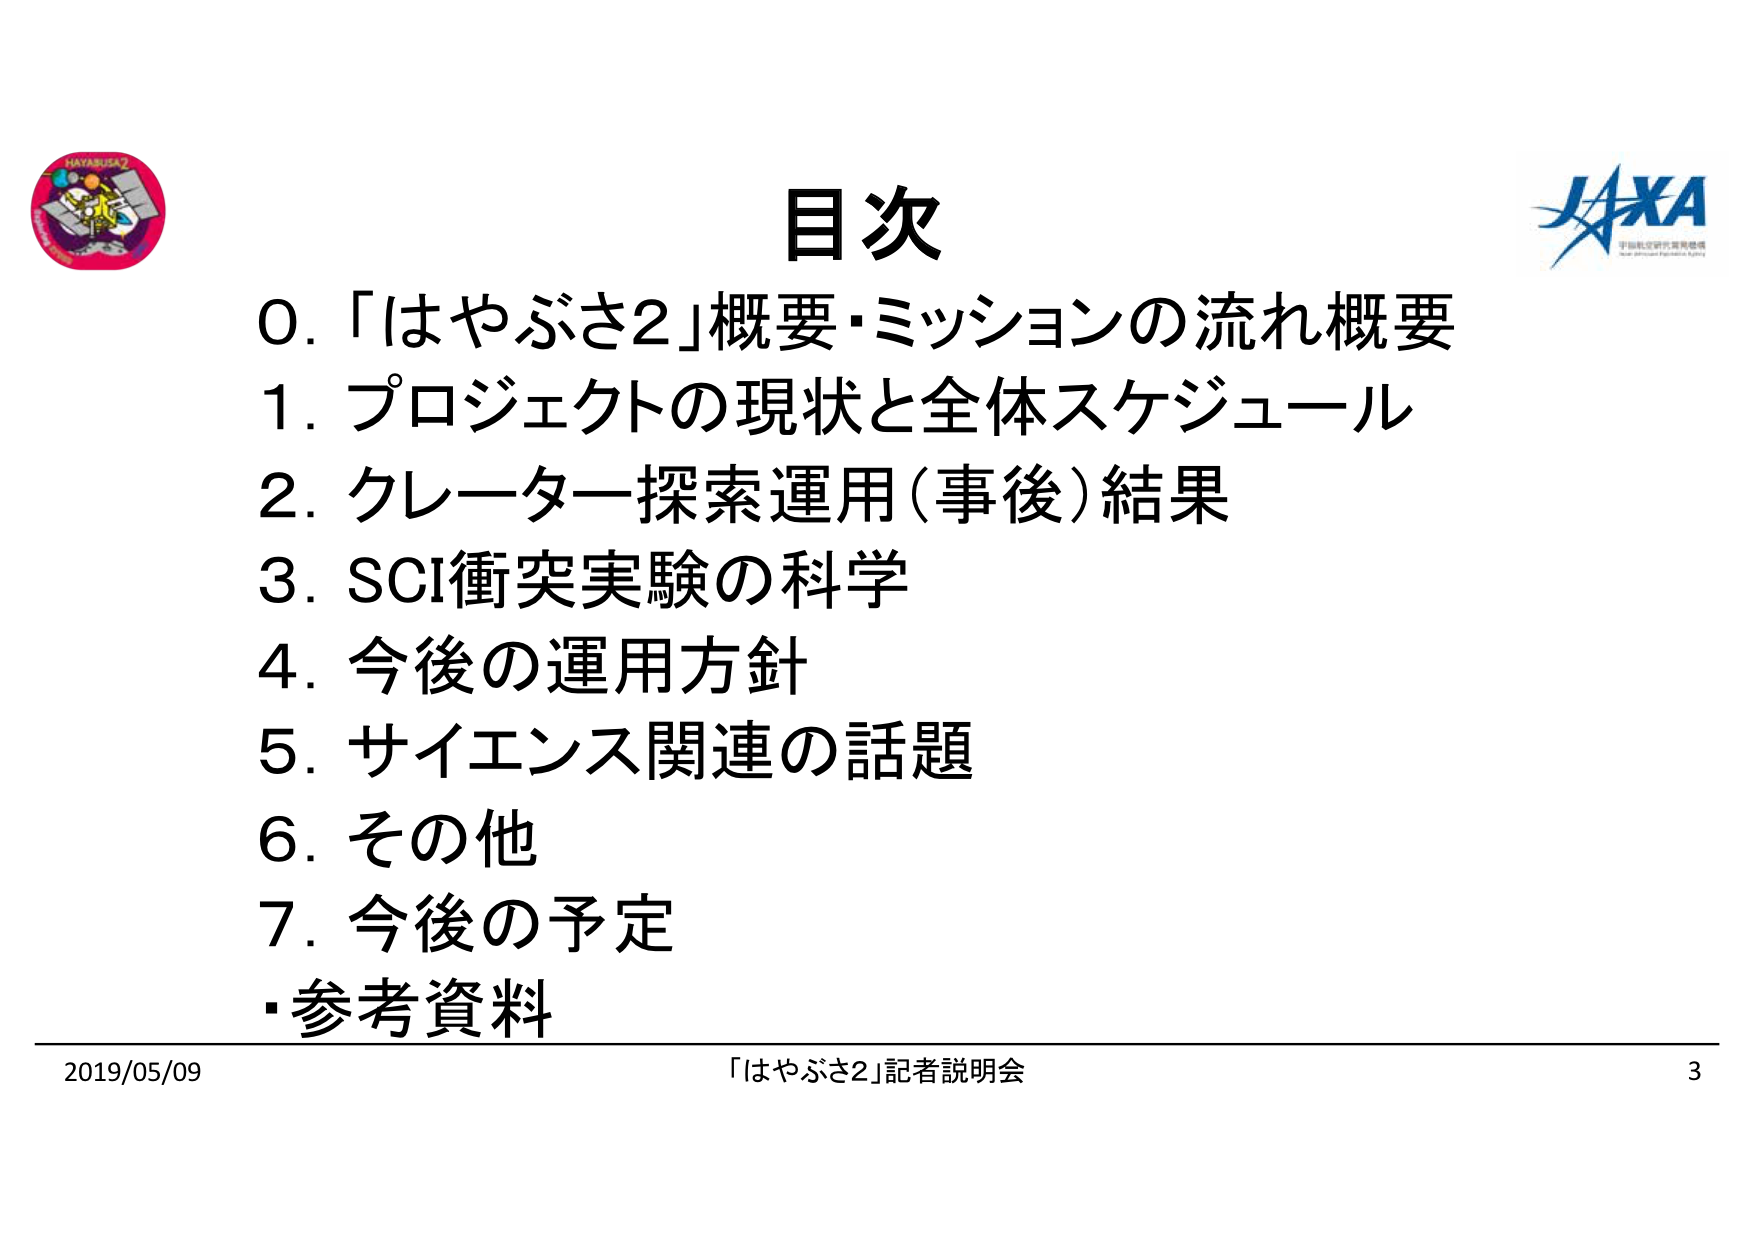 f:id:Imamura:20190509154359p:plain